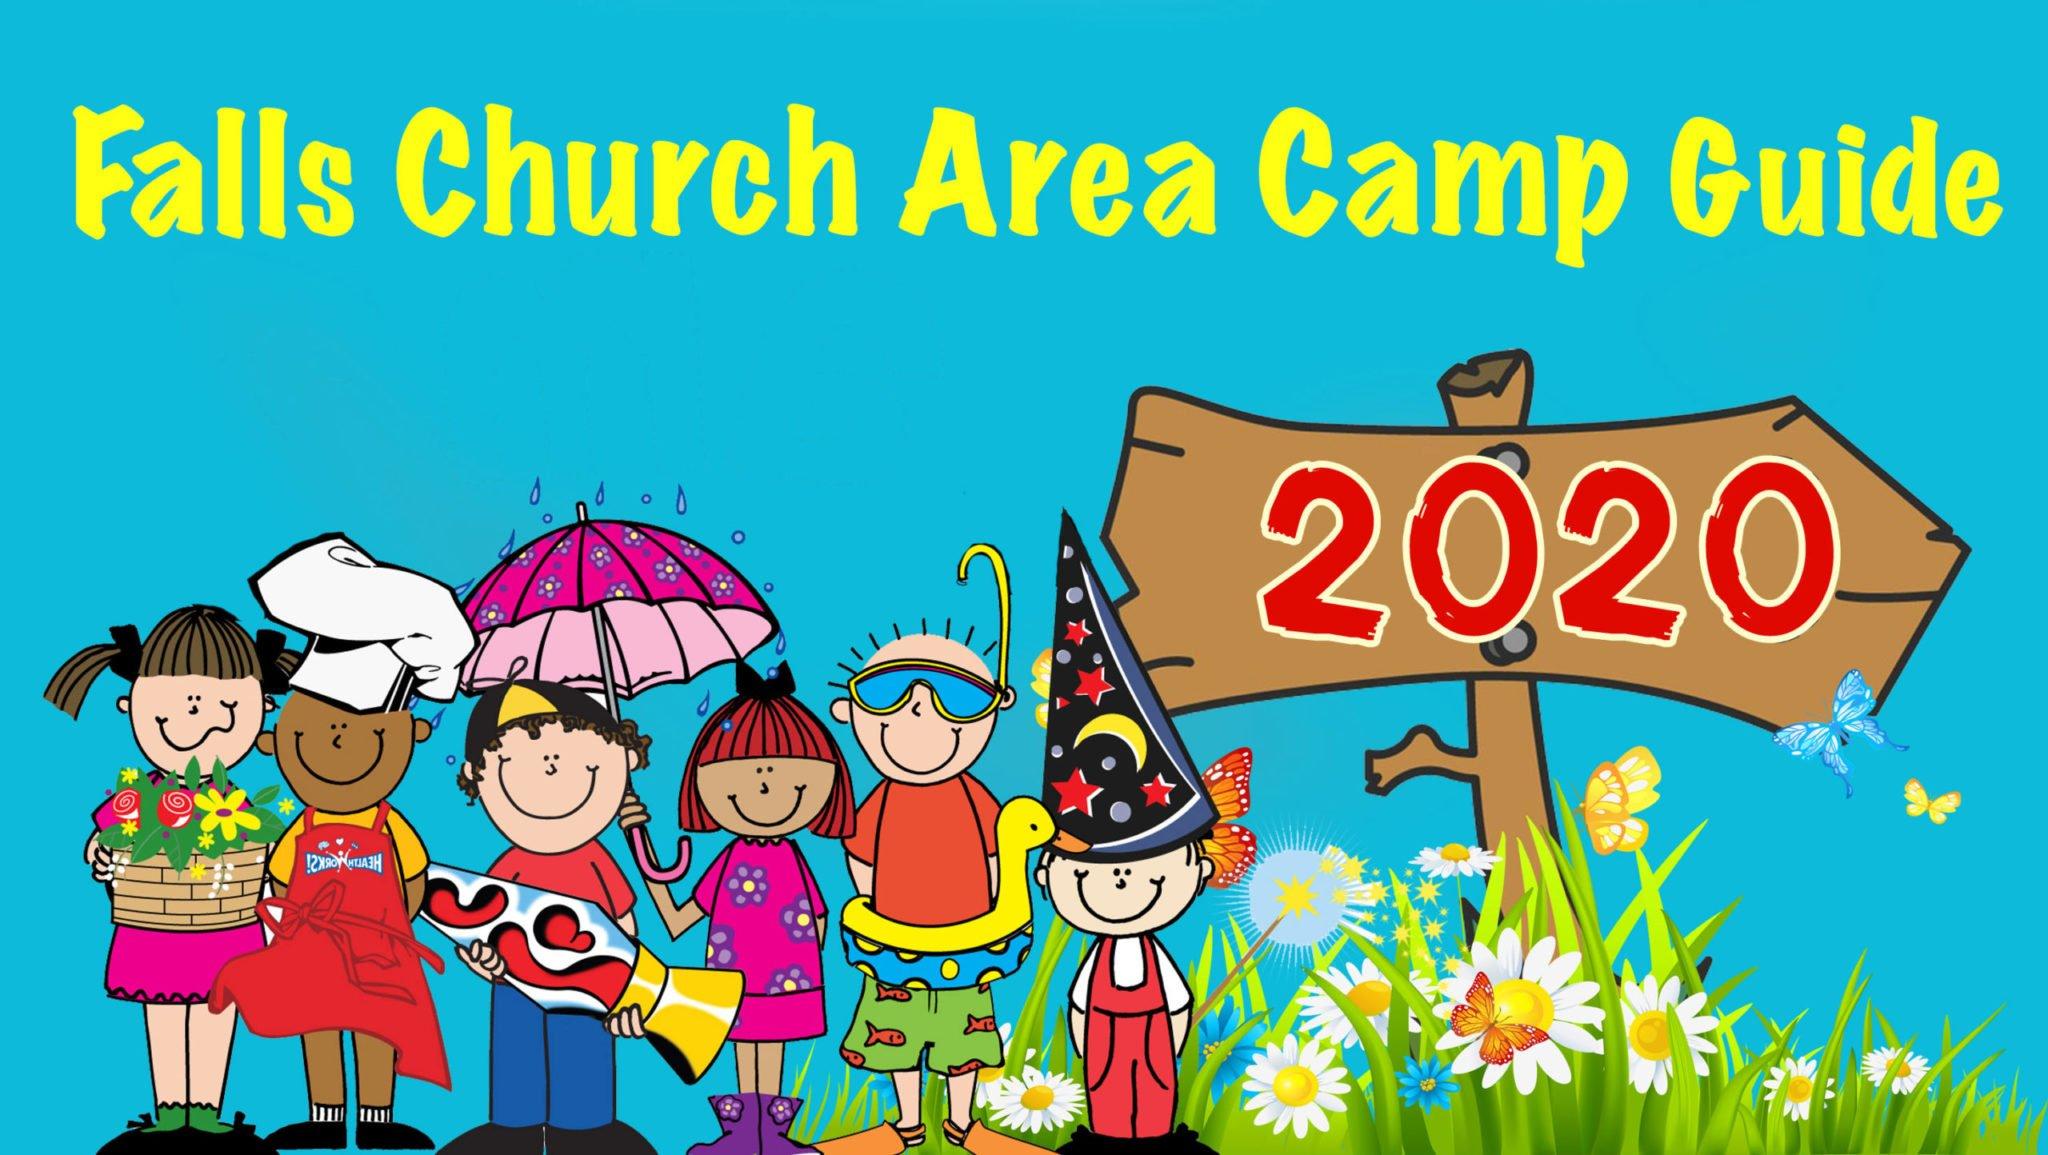 news press camp guide 2020 falls church news press online news press camp guide 2020 falls